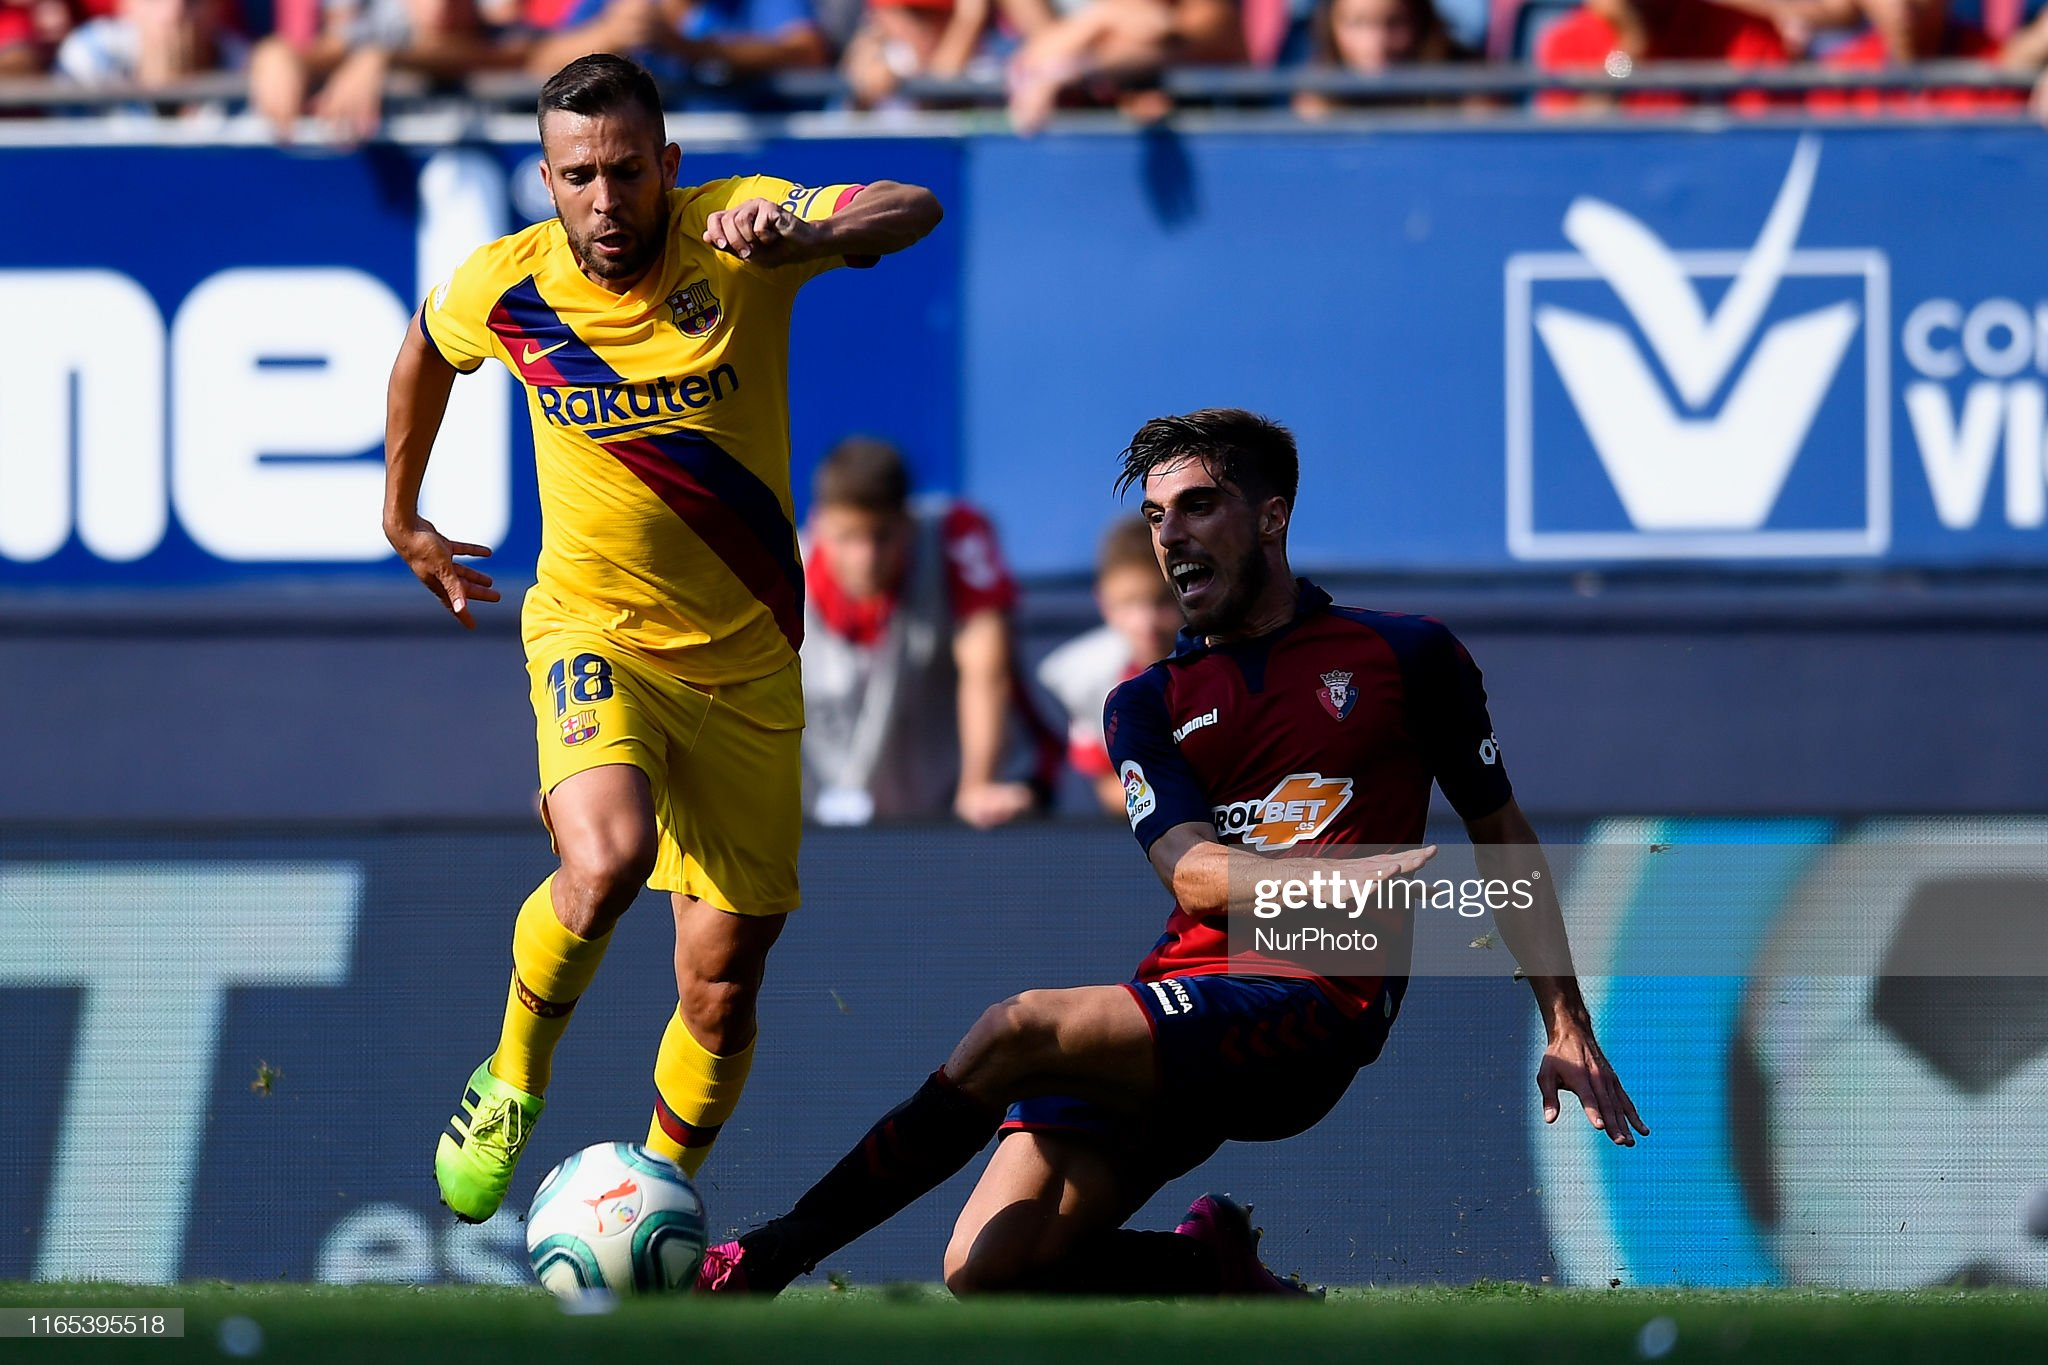 صور مباراة : أوساسونا - برشلونة 2-2 ( 31-08-2019 )  Jordi-alba-of-barcelona-and-nacho-vidal-of-osasuna-competes-for-the-picture-id1165395518?s=2048x2048